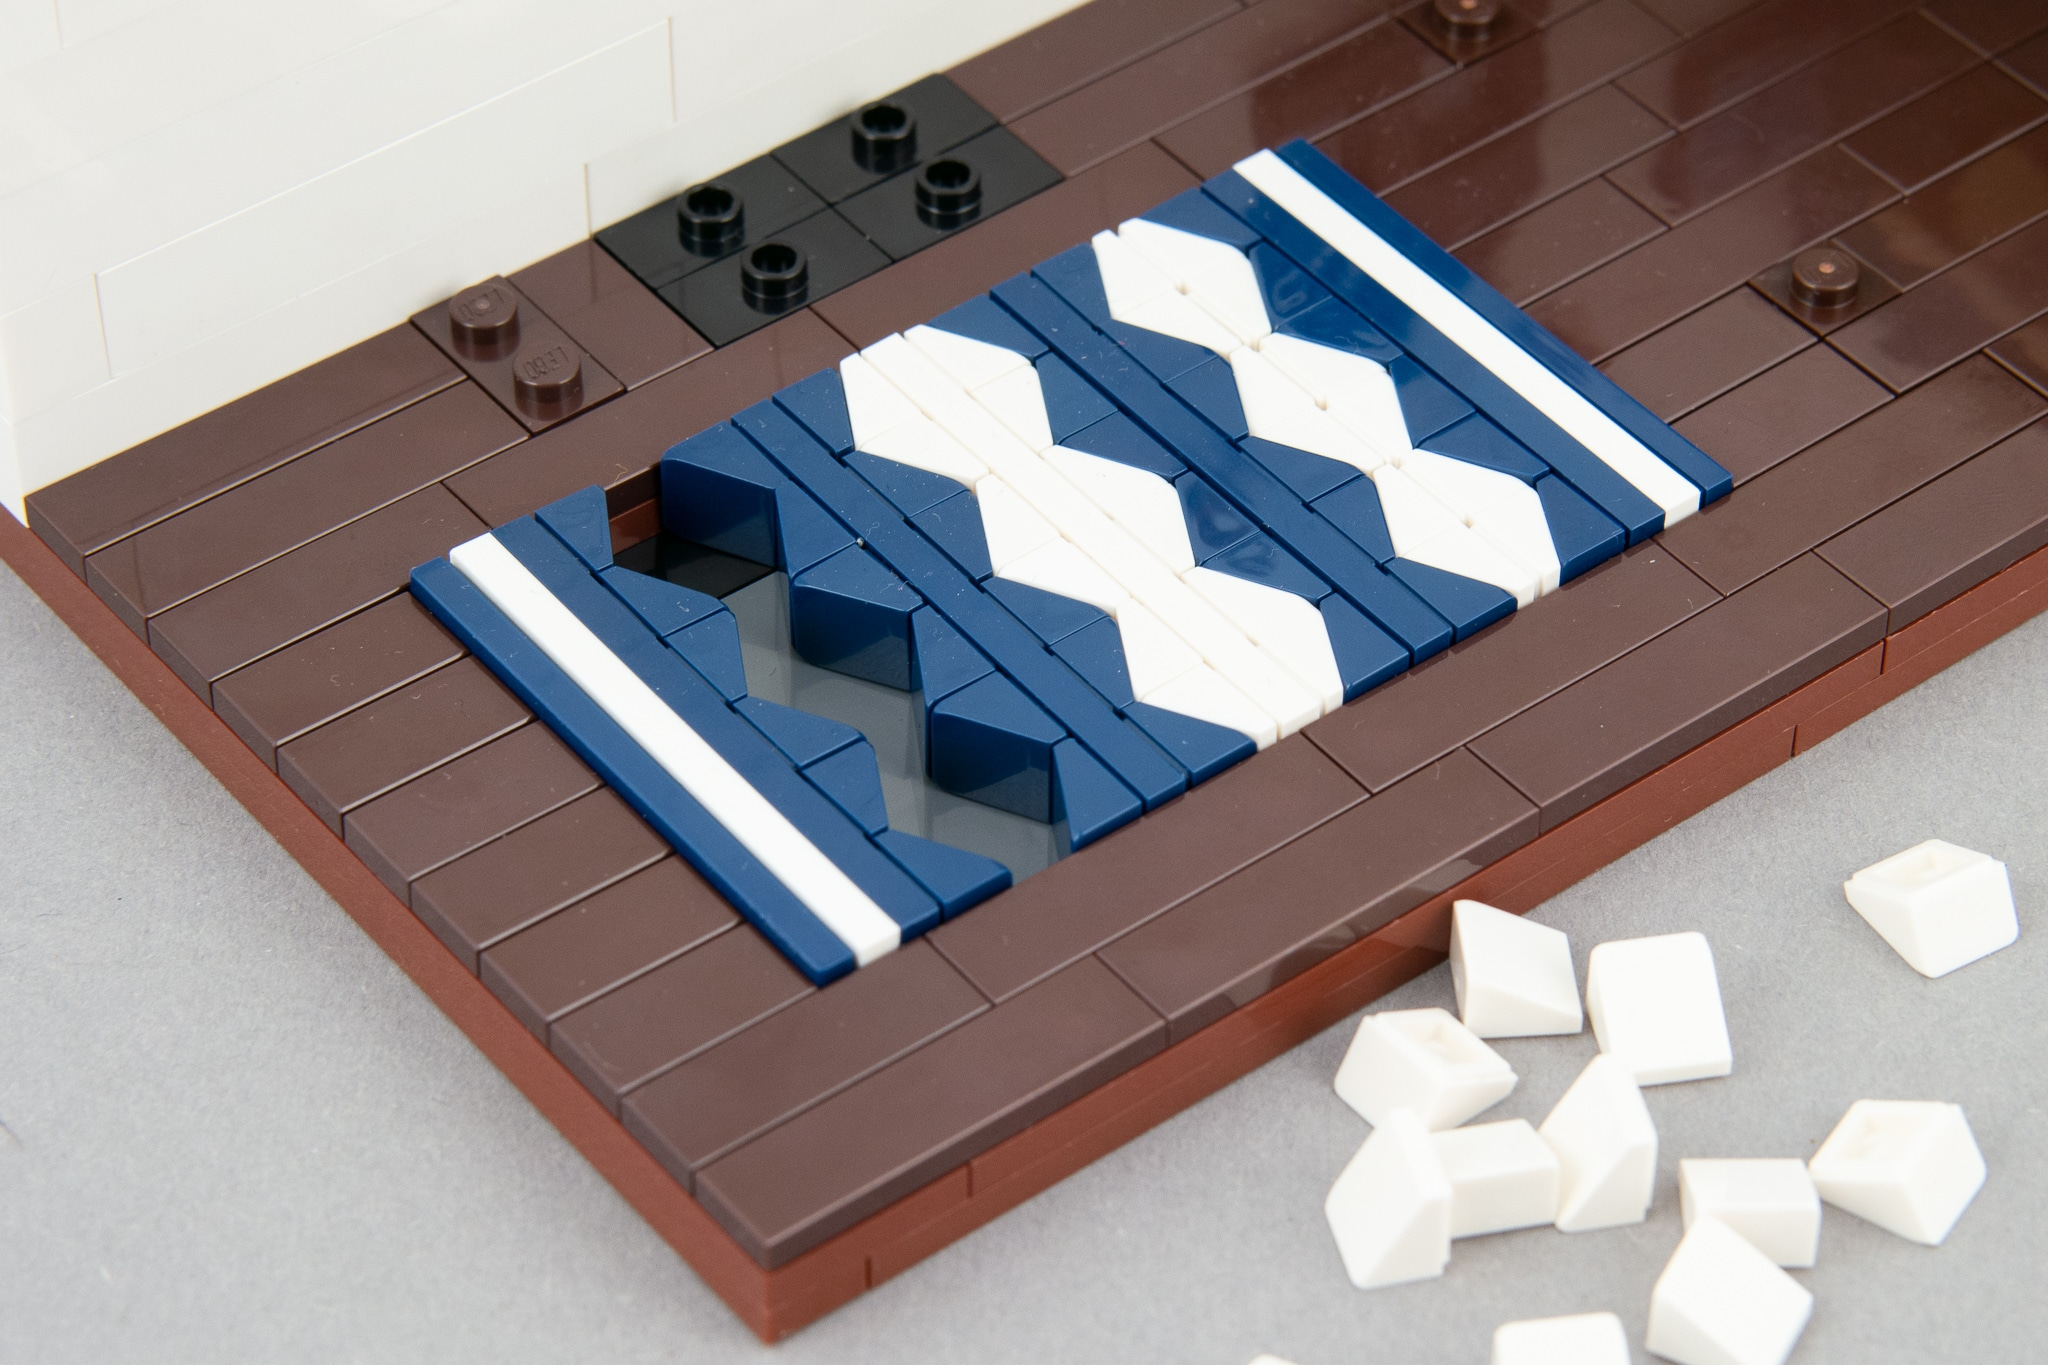 LEGO Schlafzimmer Moc Teppich (4)